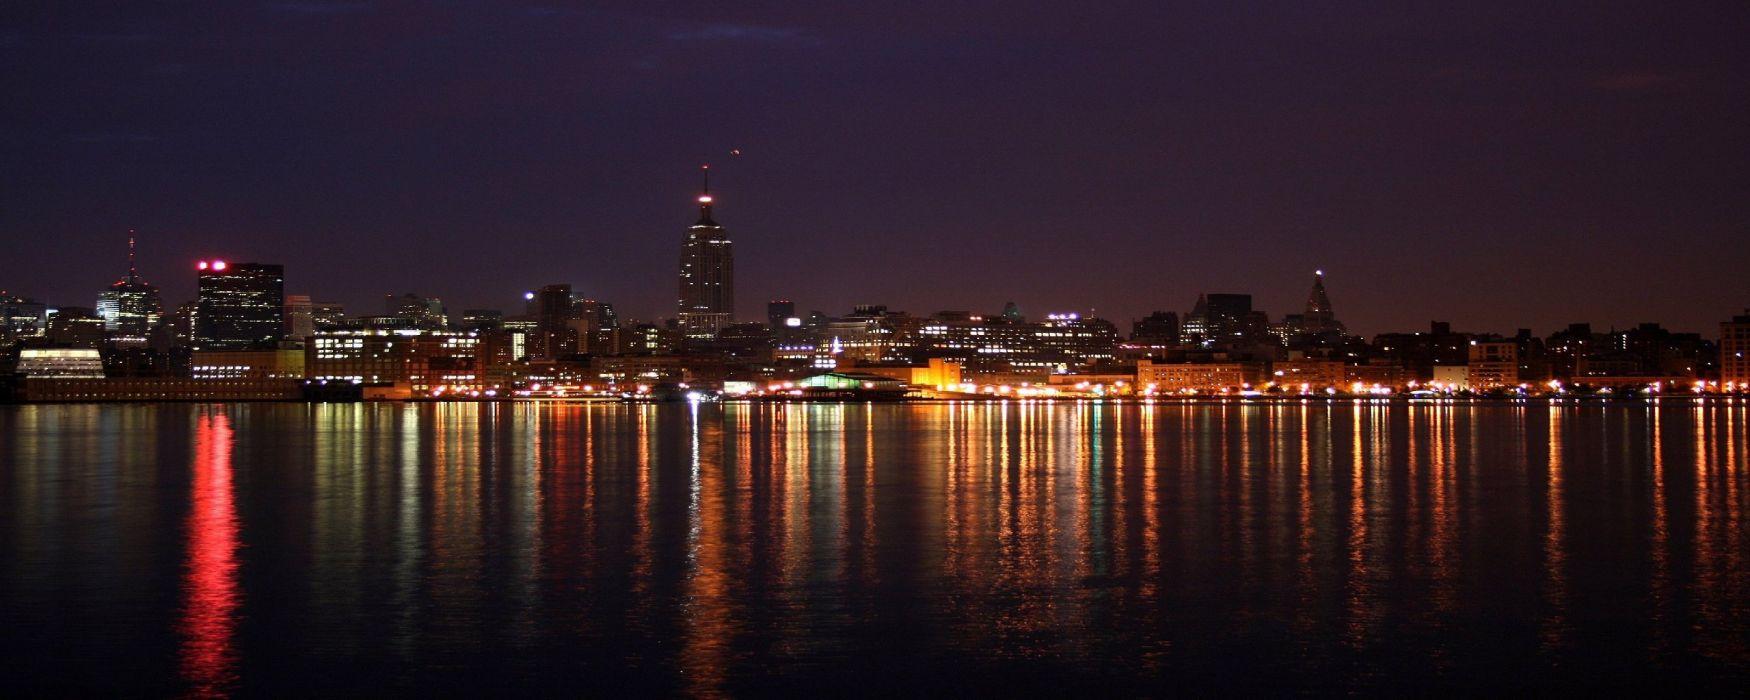 night cities wallpaper